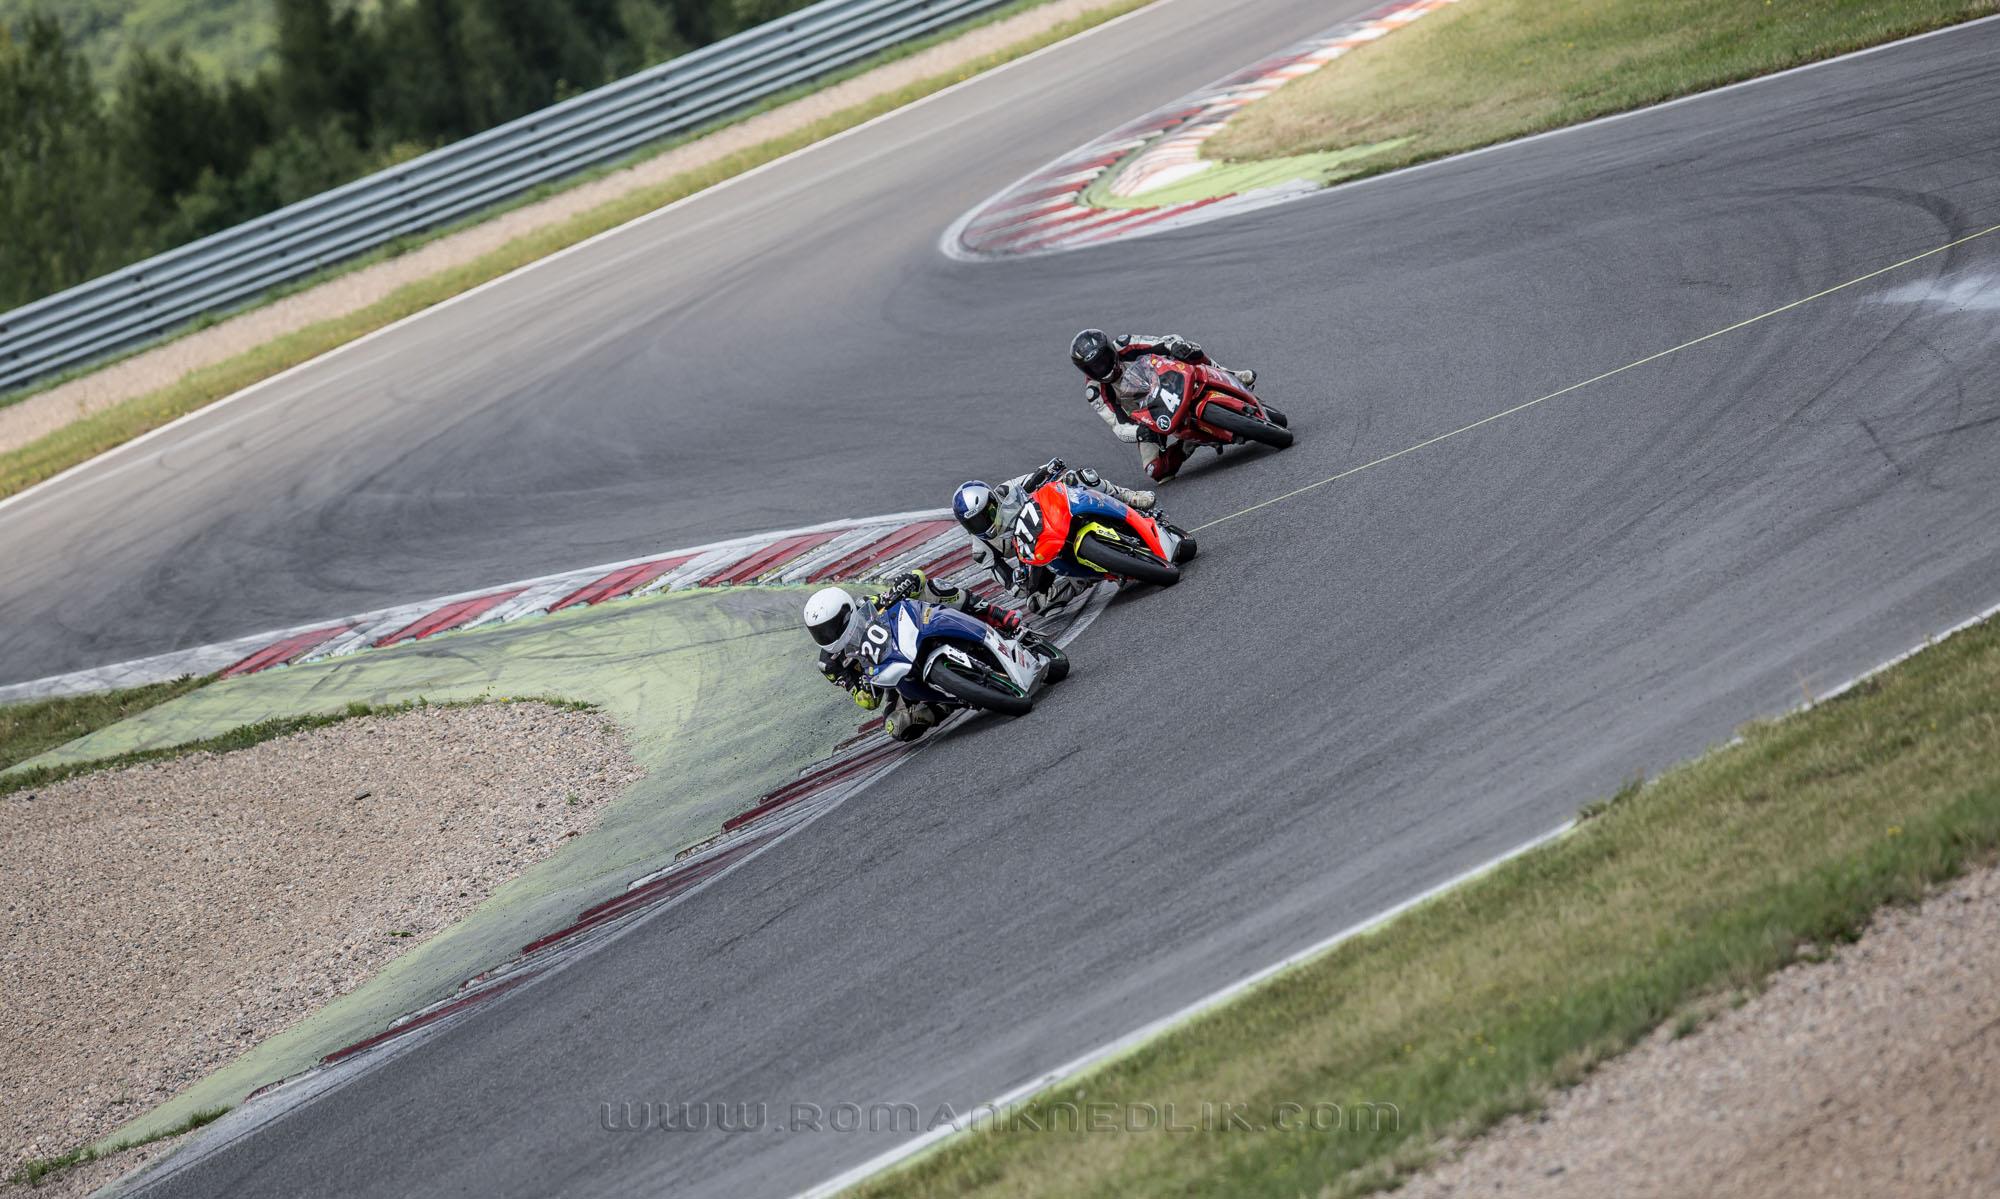 Alpe_Adria_European_Championship-21